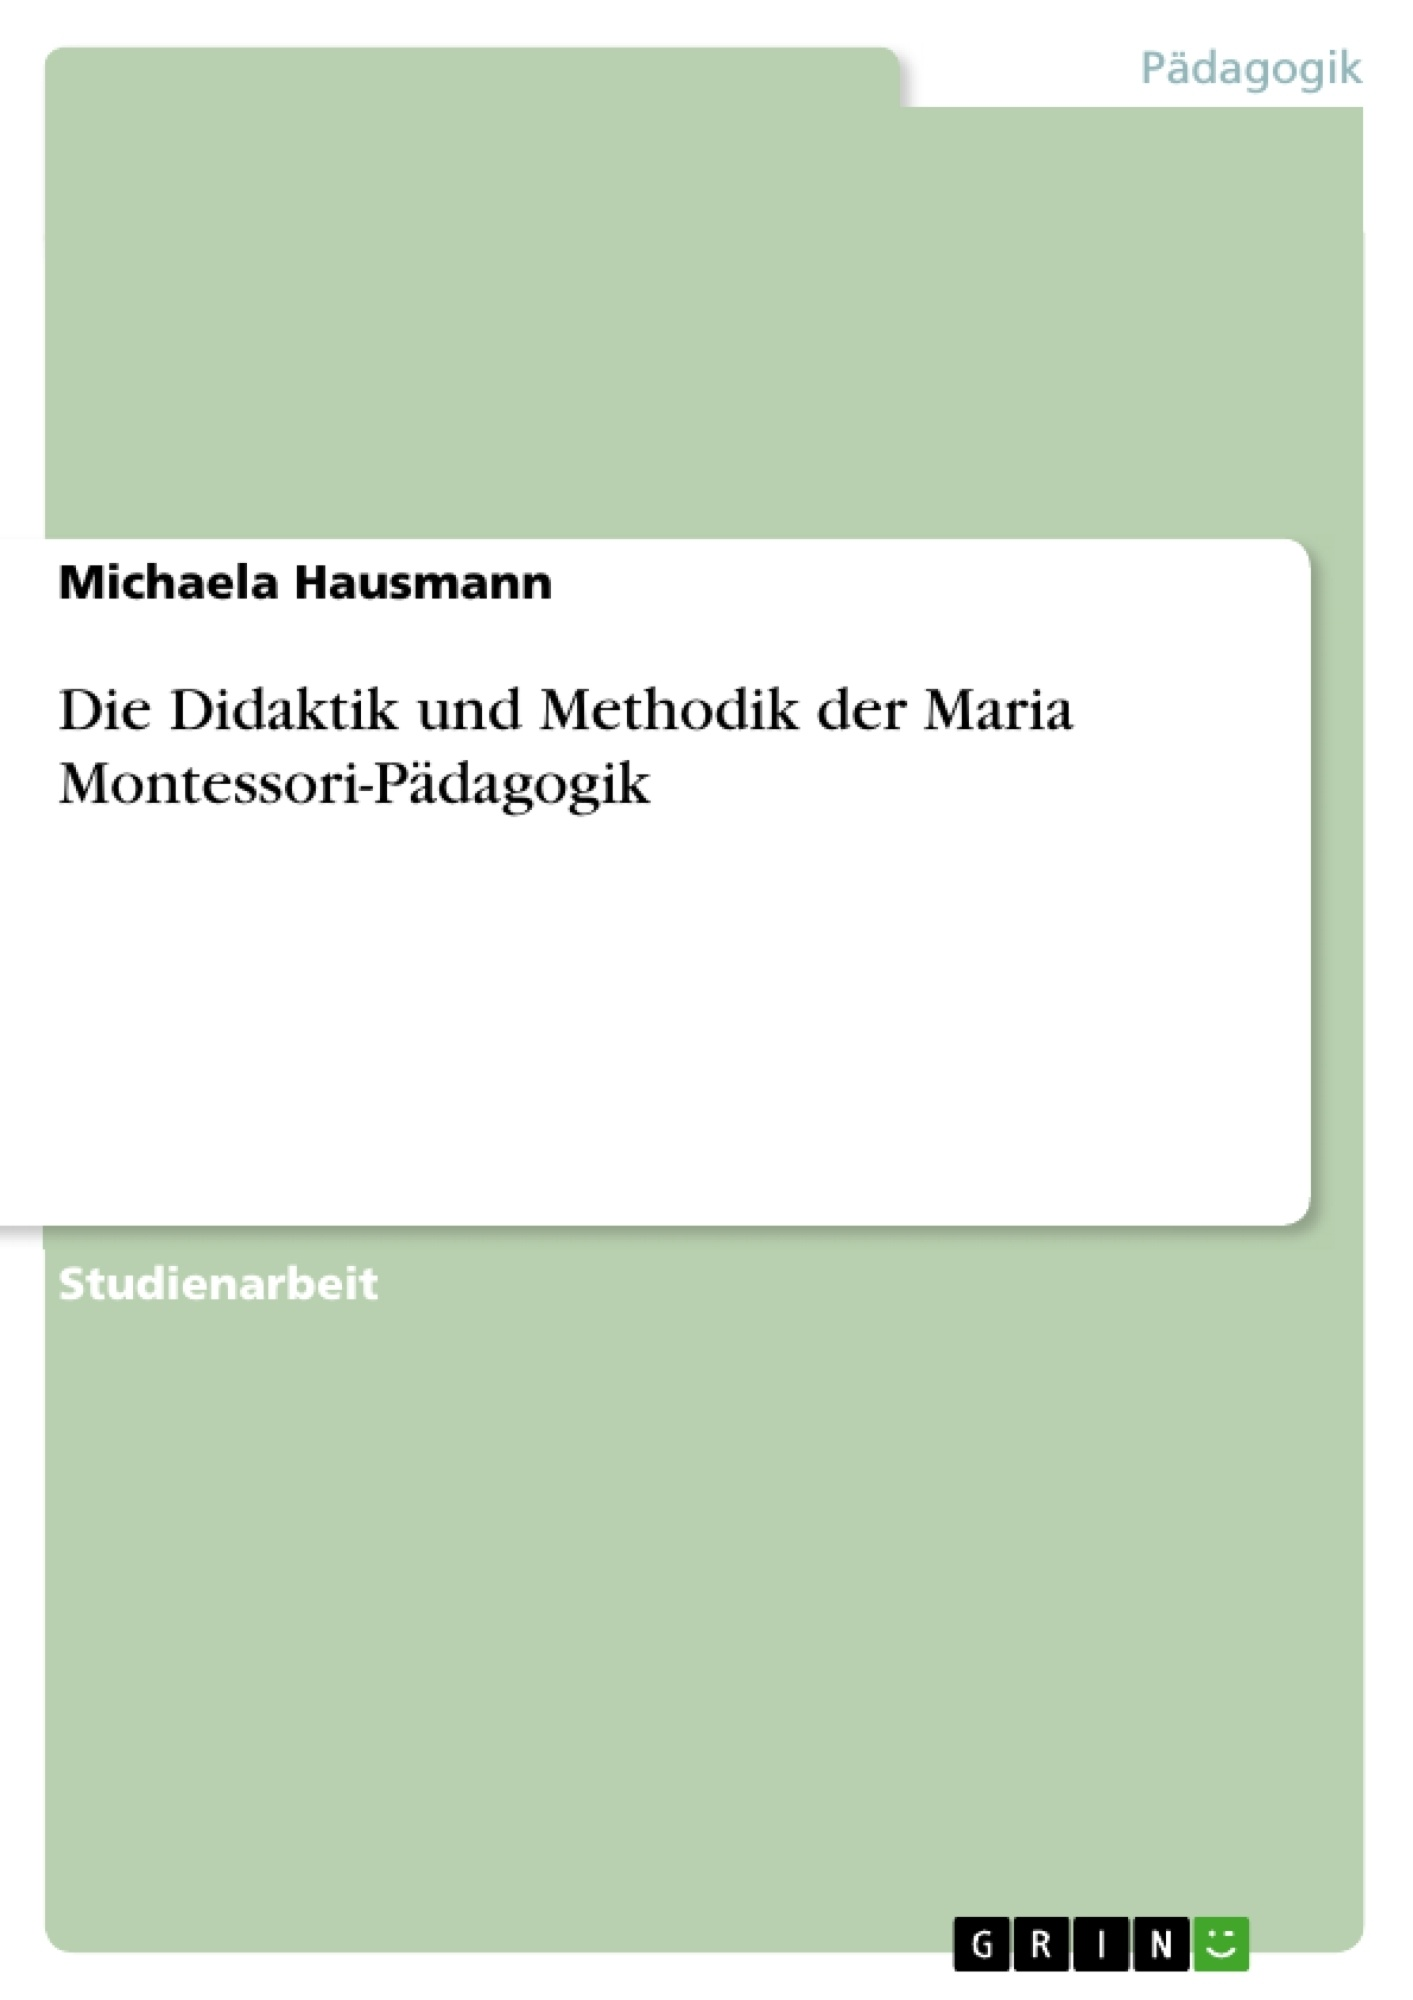 Titel: Die Didaktik und Methodik der Maria Montessori-Pädagogik